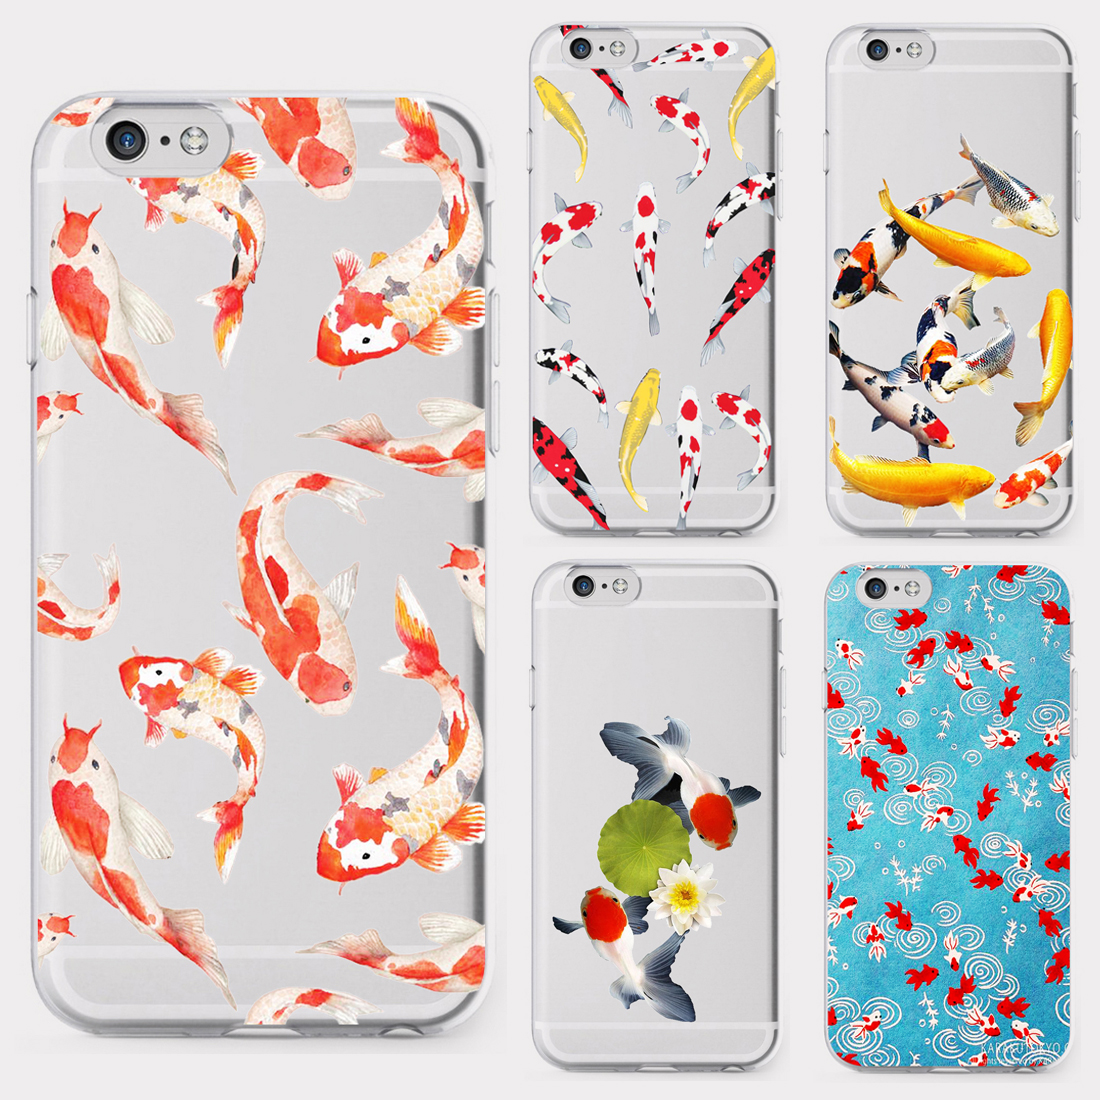 Koi Fish Pond Goldfish Blessing милый мягкий силиконовый прозрачный чехол для телефона iphone 11Pro MAX 6 6s 7 8plus 5s X XS XR XSMax